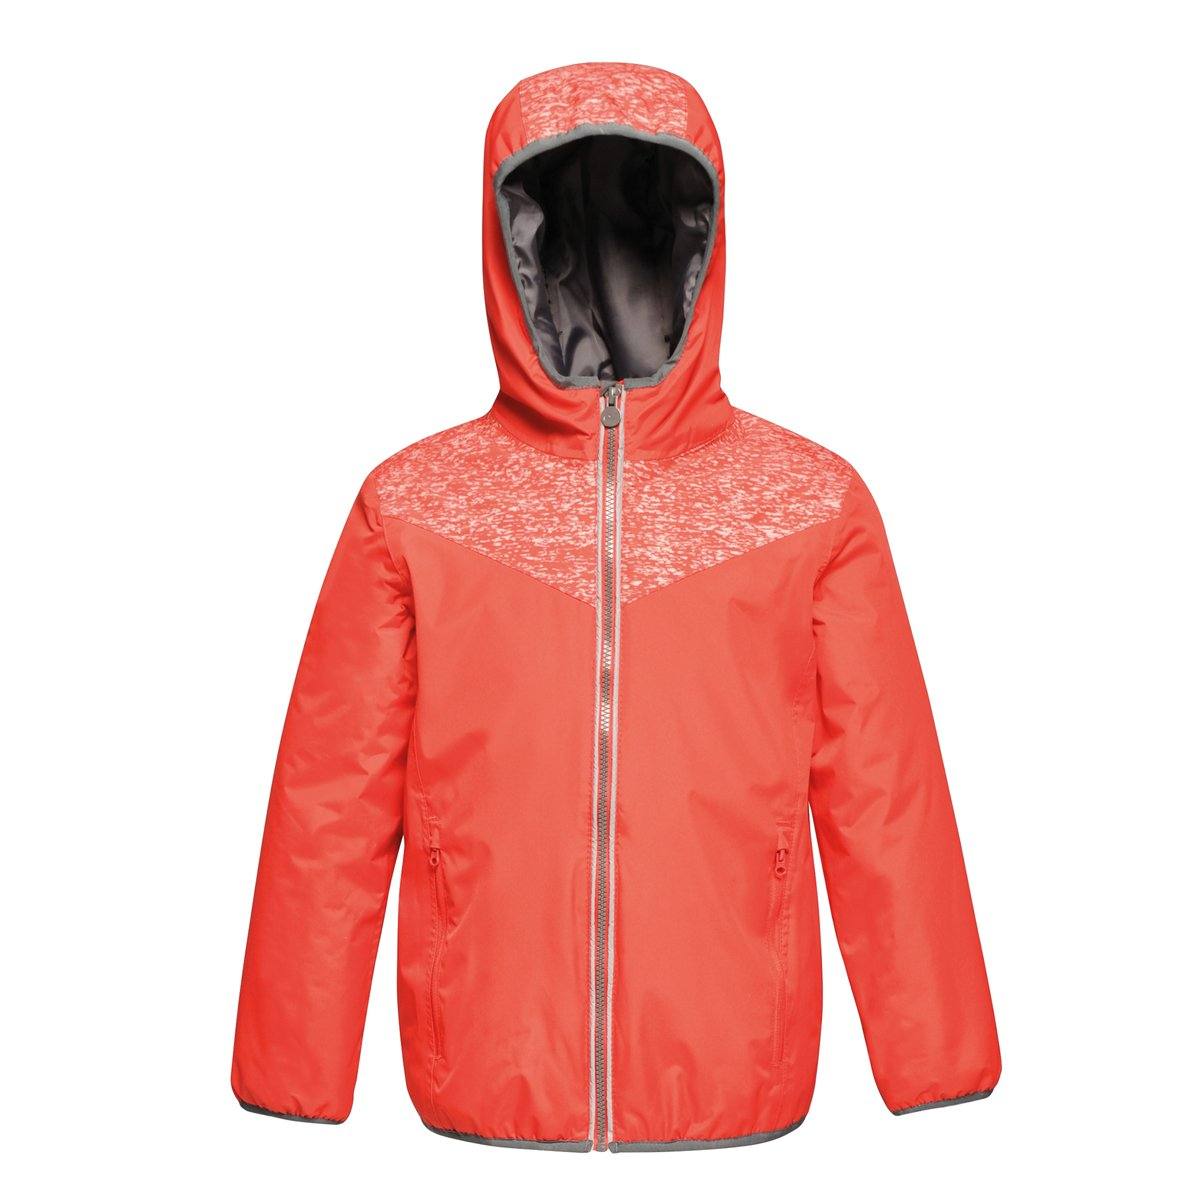 Regatta TRA318 Kids Reflector Jacket